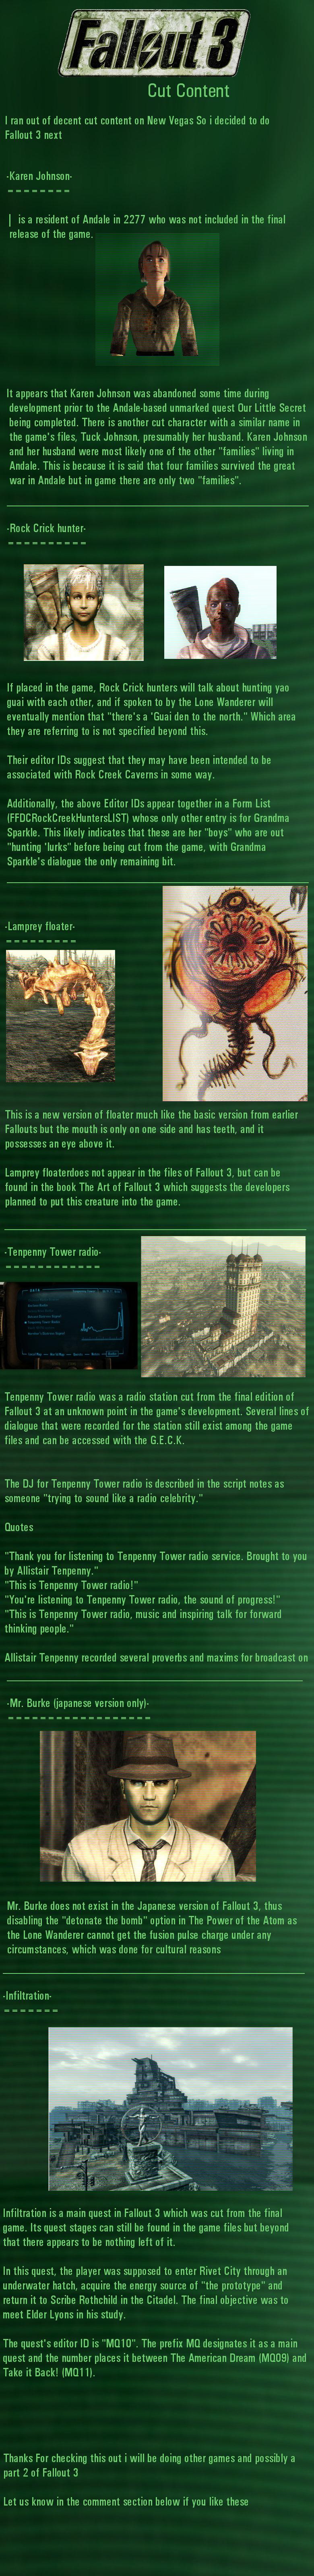 Fallout 3 Cut Content. Fallout 3 Cut Content NEW VEGAS CUT CONTENT BELOW PART 1: /channel/fallout/Fallout+New+Vegas+Cut+Content/olMBLby/ PART 2: /channel/fallou Fallout 3 Cut Co